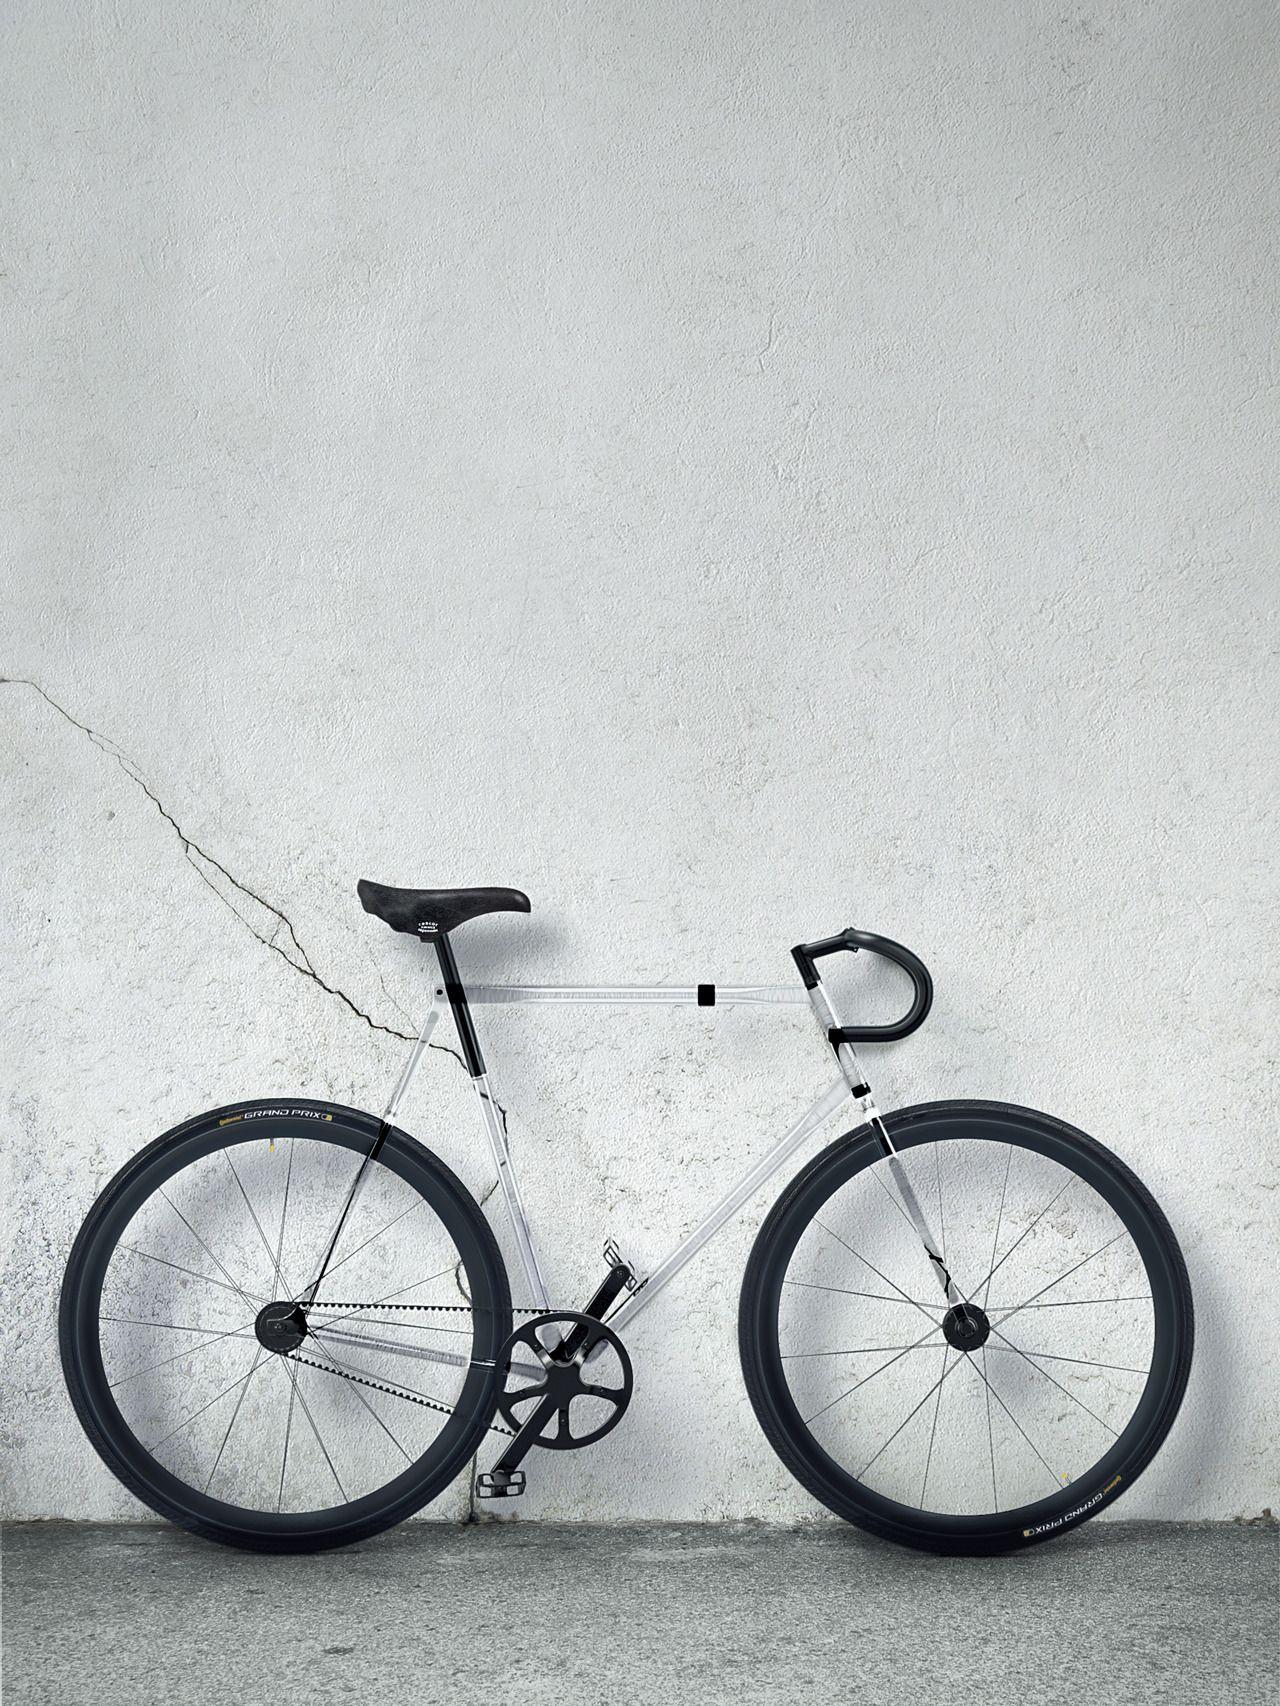 tumblr_mxsdd1IWzT1shqs68o1_1280.jpg (1280×1706) | Bike | Pinterest ...